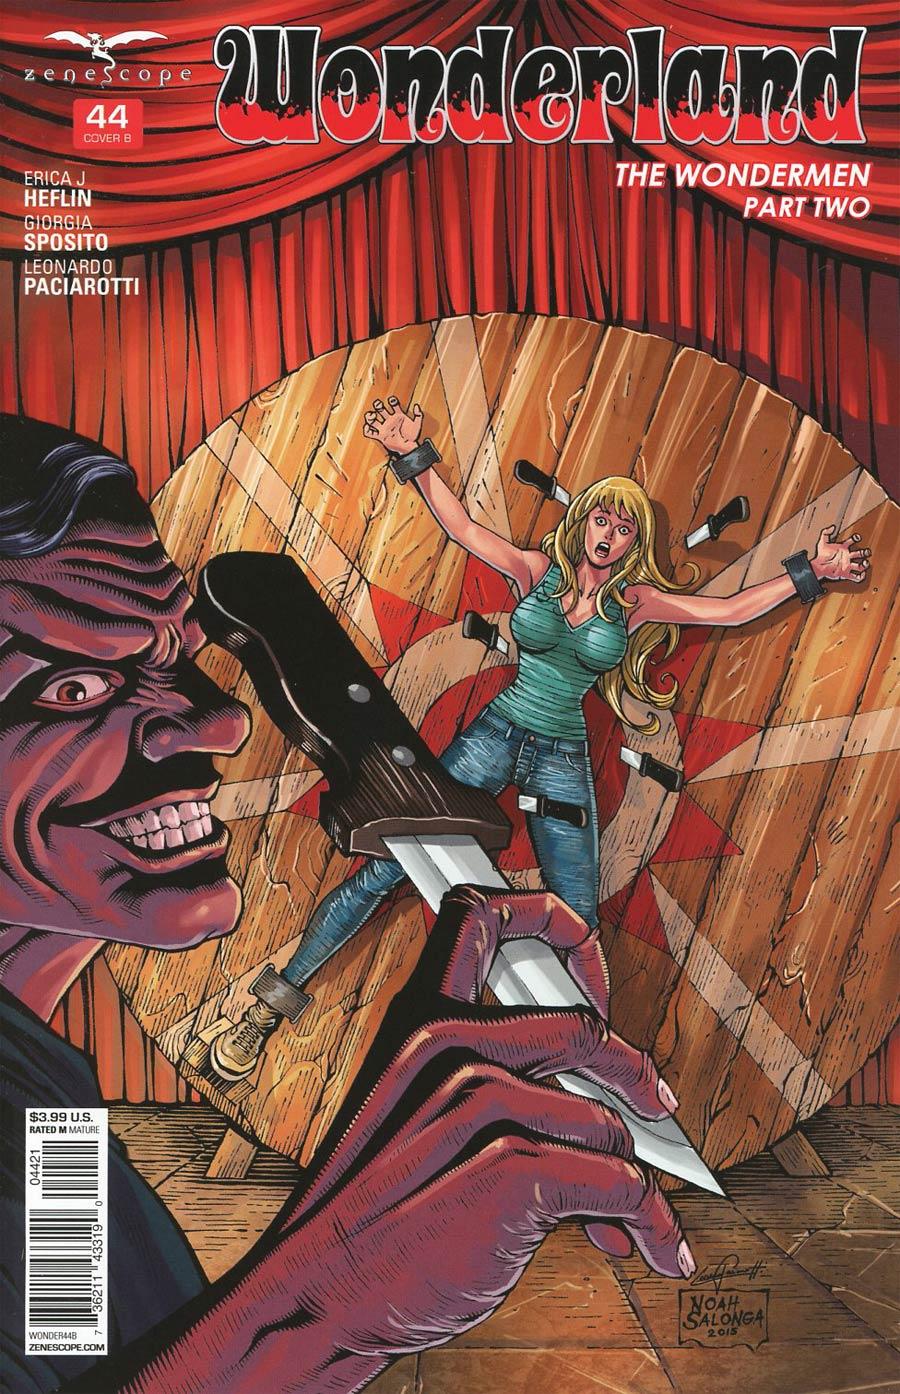 Grimm Fairy Tales Presents Wonderland Vol 2 #44 Cover B Noah Salonga